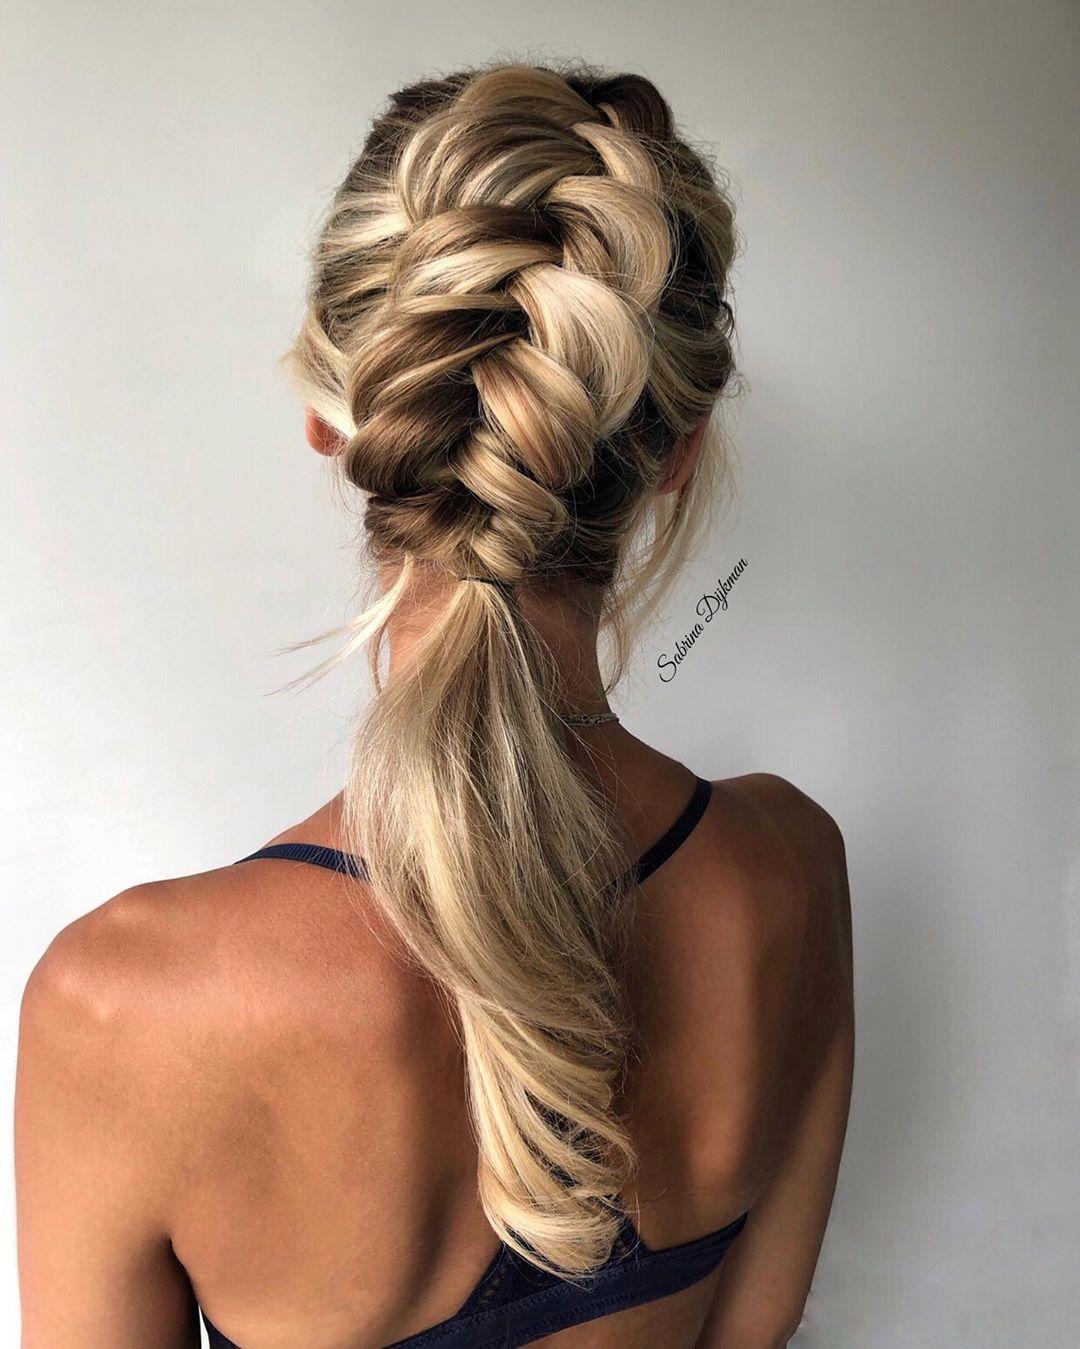 💓💓💓 . . Sabrinadijkmanhair Alternah Alternahaircare - Hair Styles